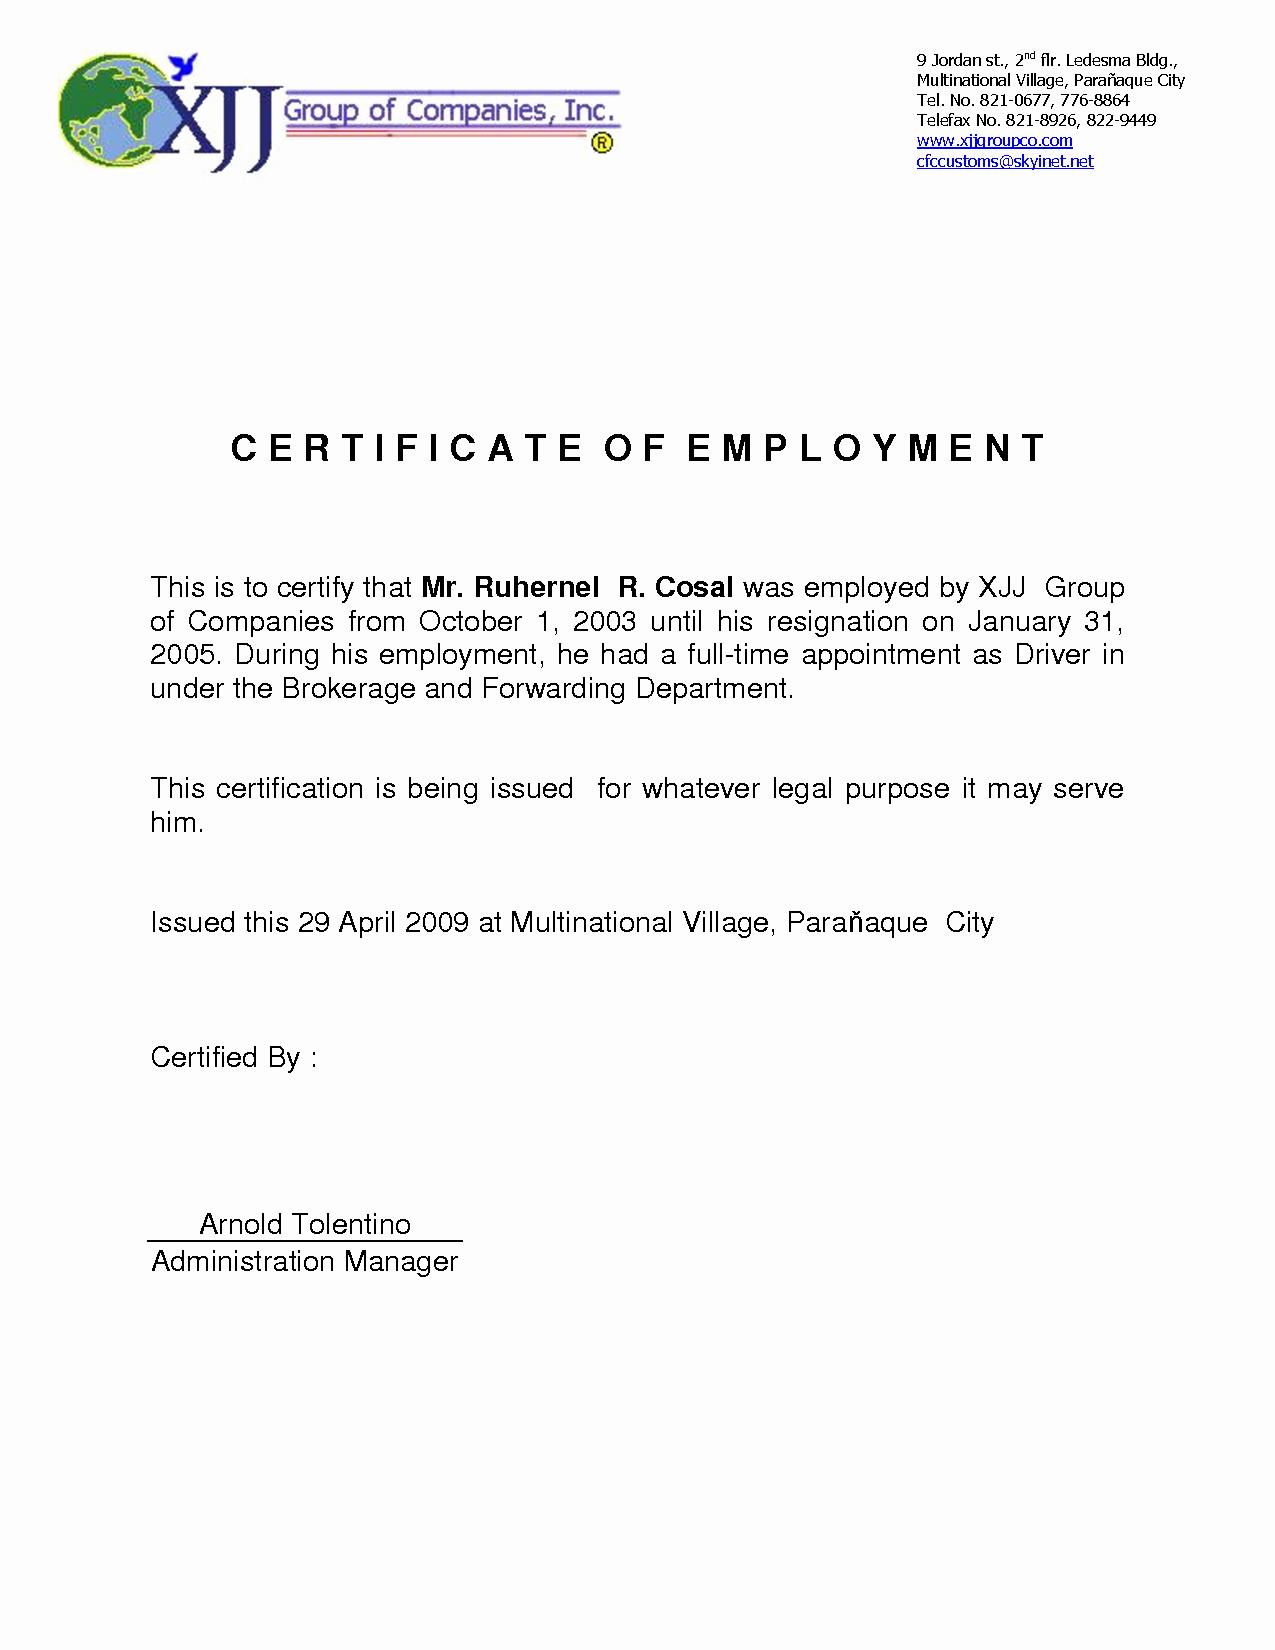 Certificate Of Employment Template Elegant 9 Best Of Certificate Employment Template